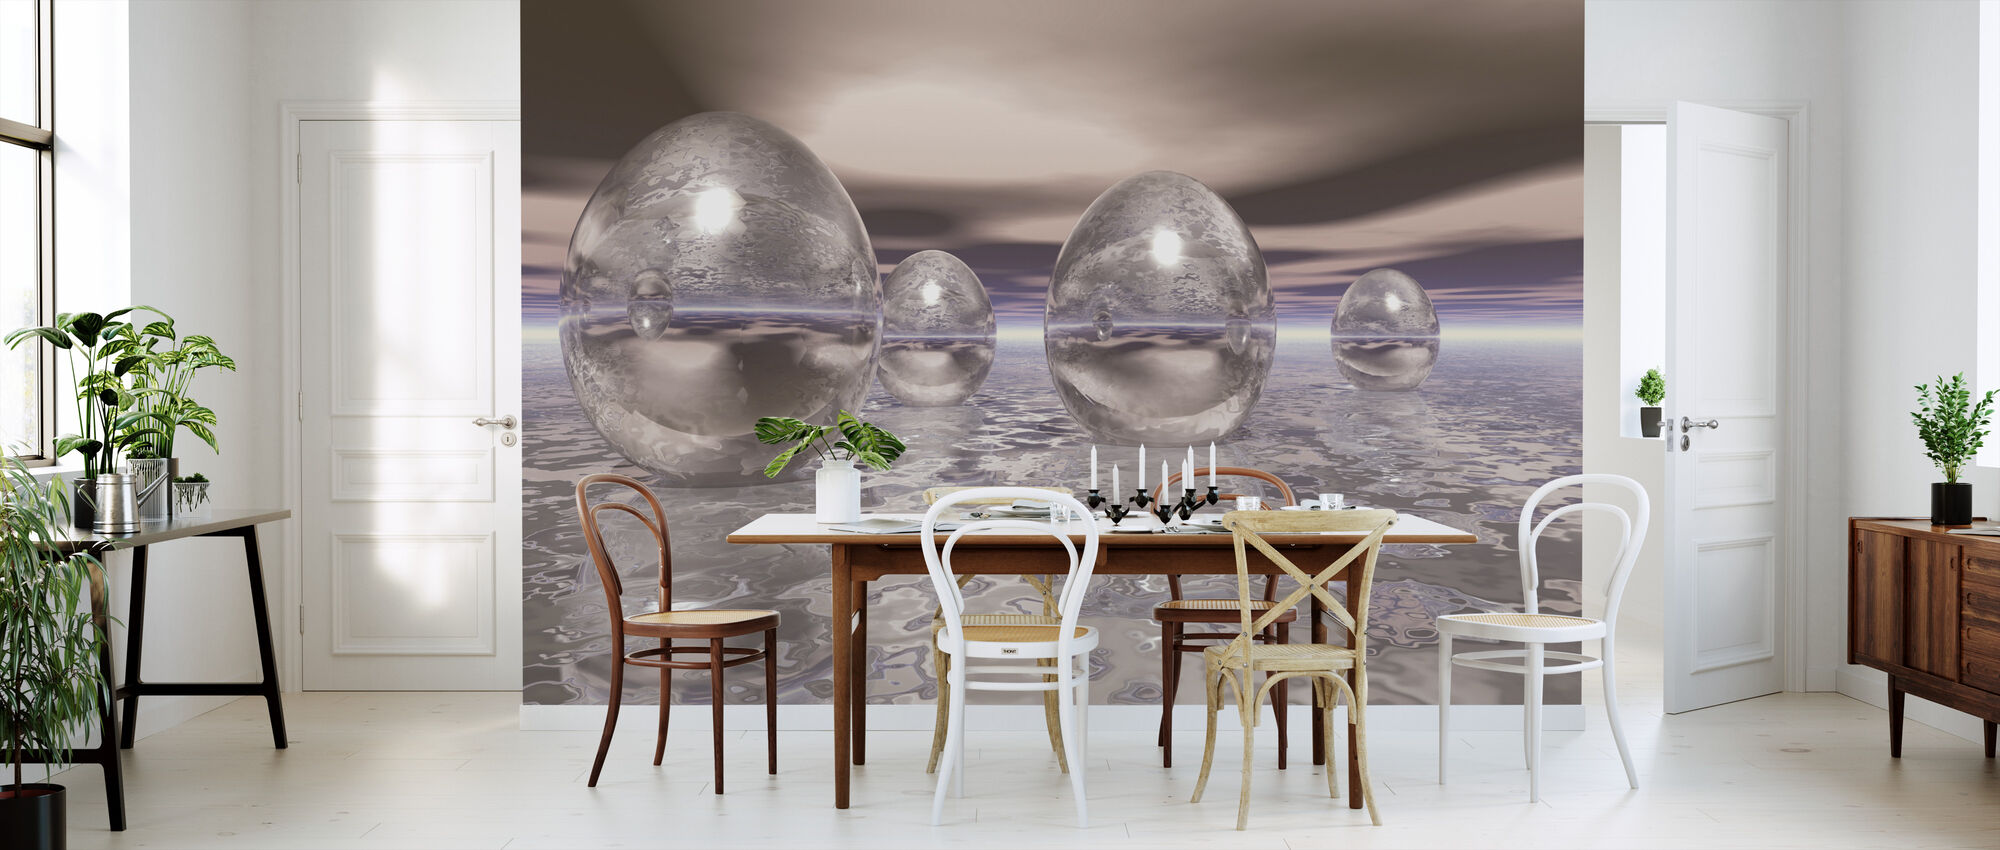 3D Floating Eggs - Wallpaper - Kitchen